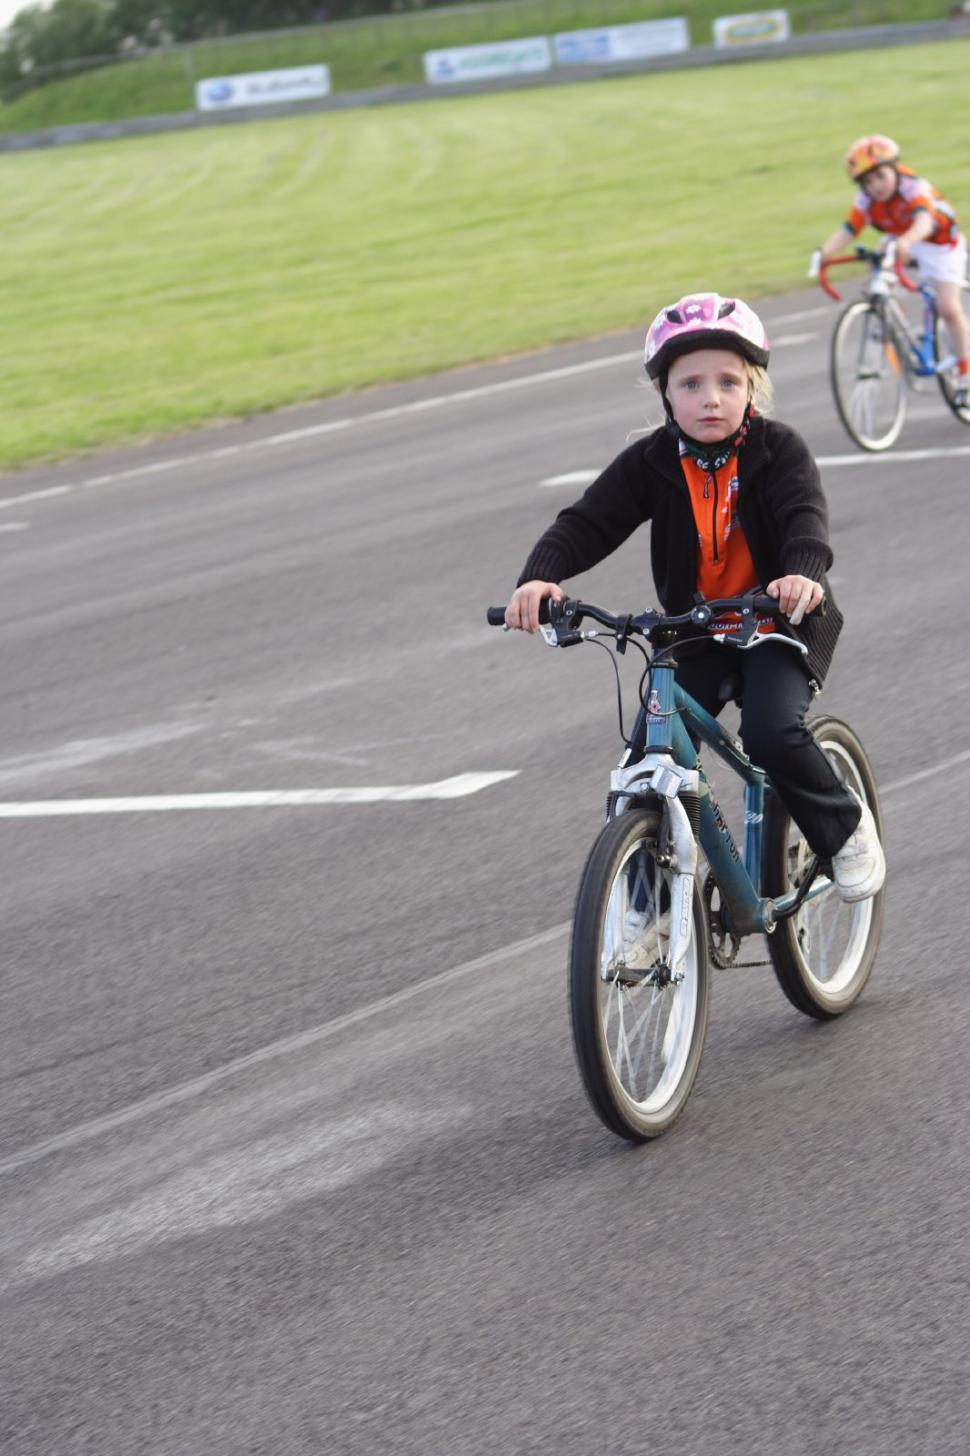 Kids on bikes (©Dave Atkinson) 03